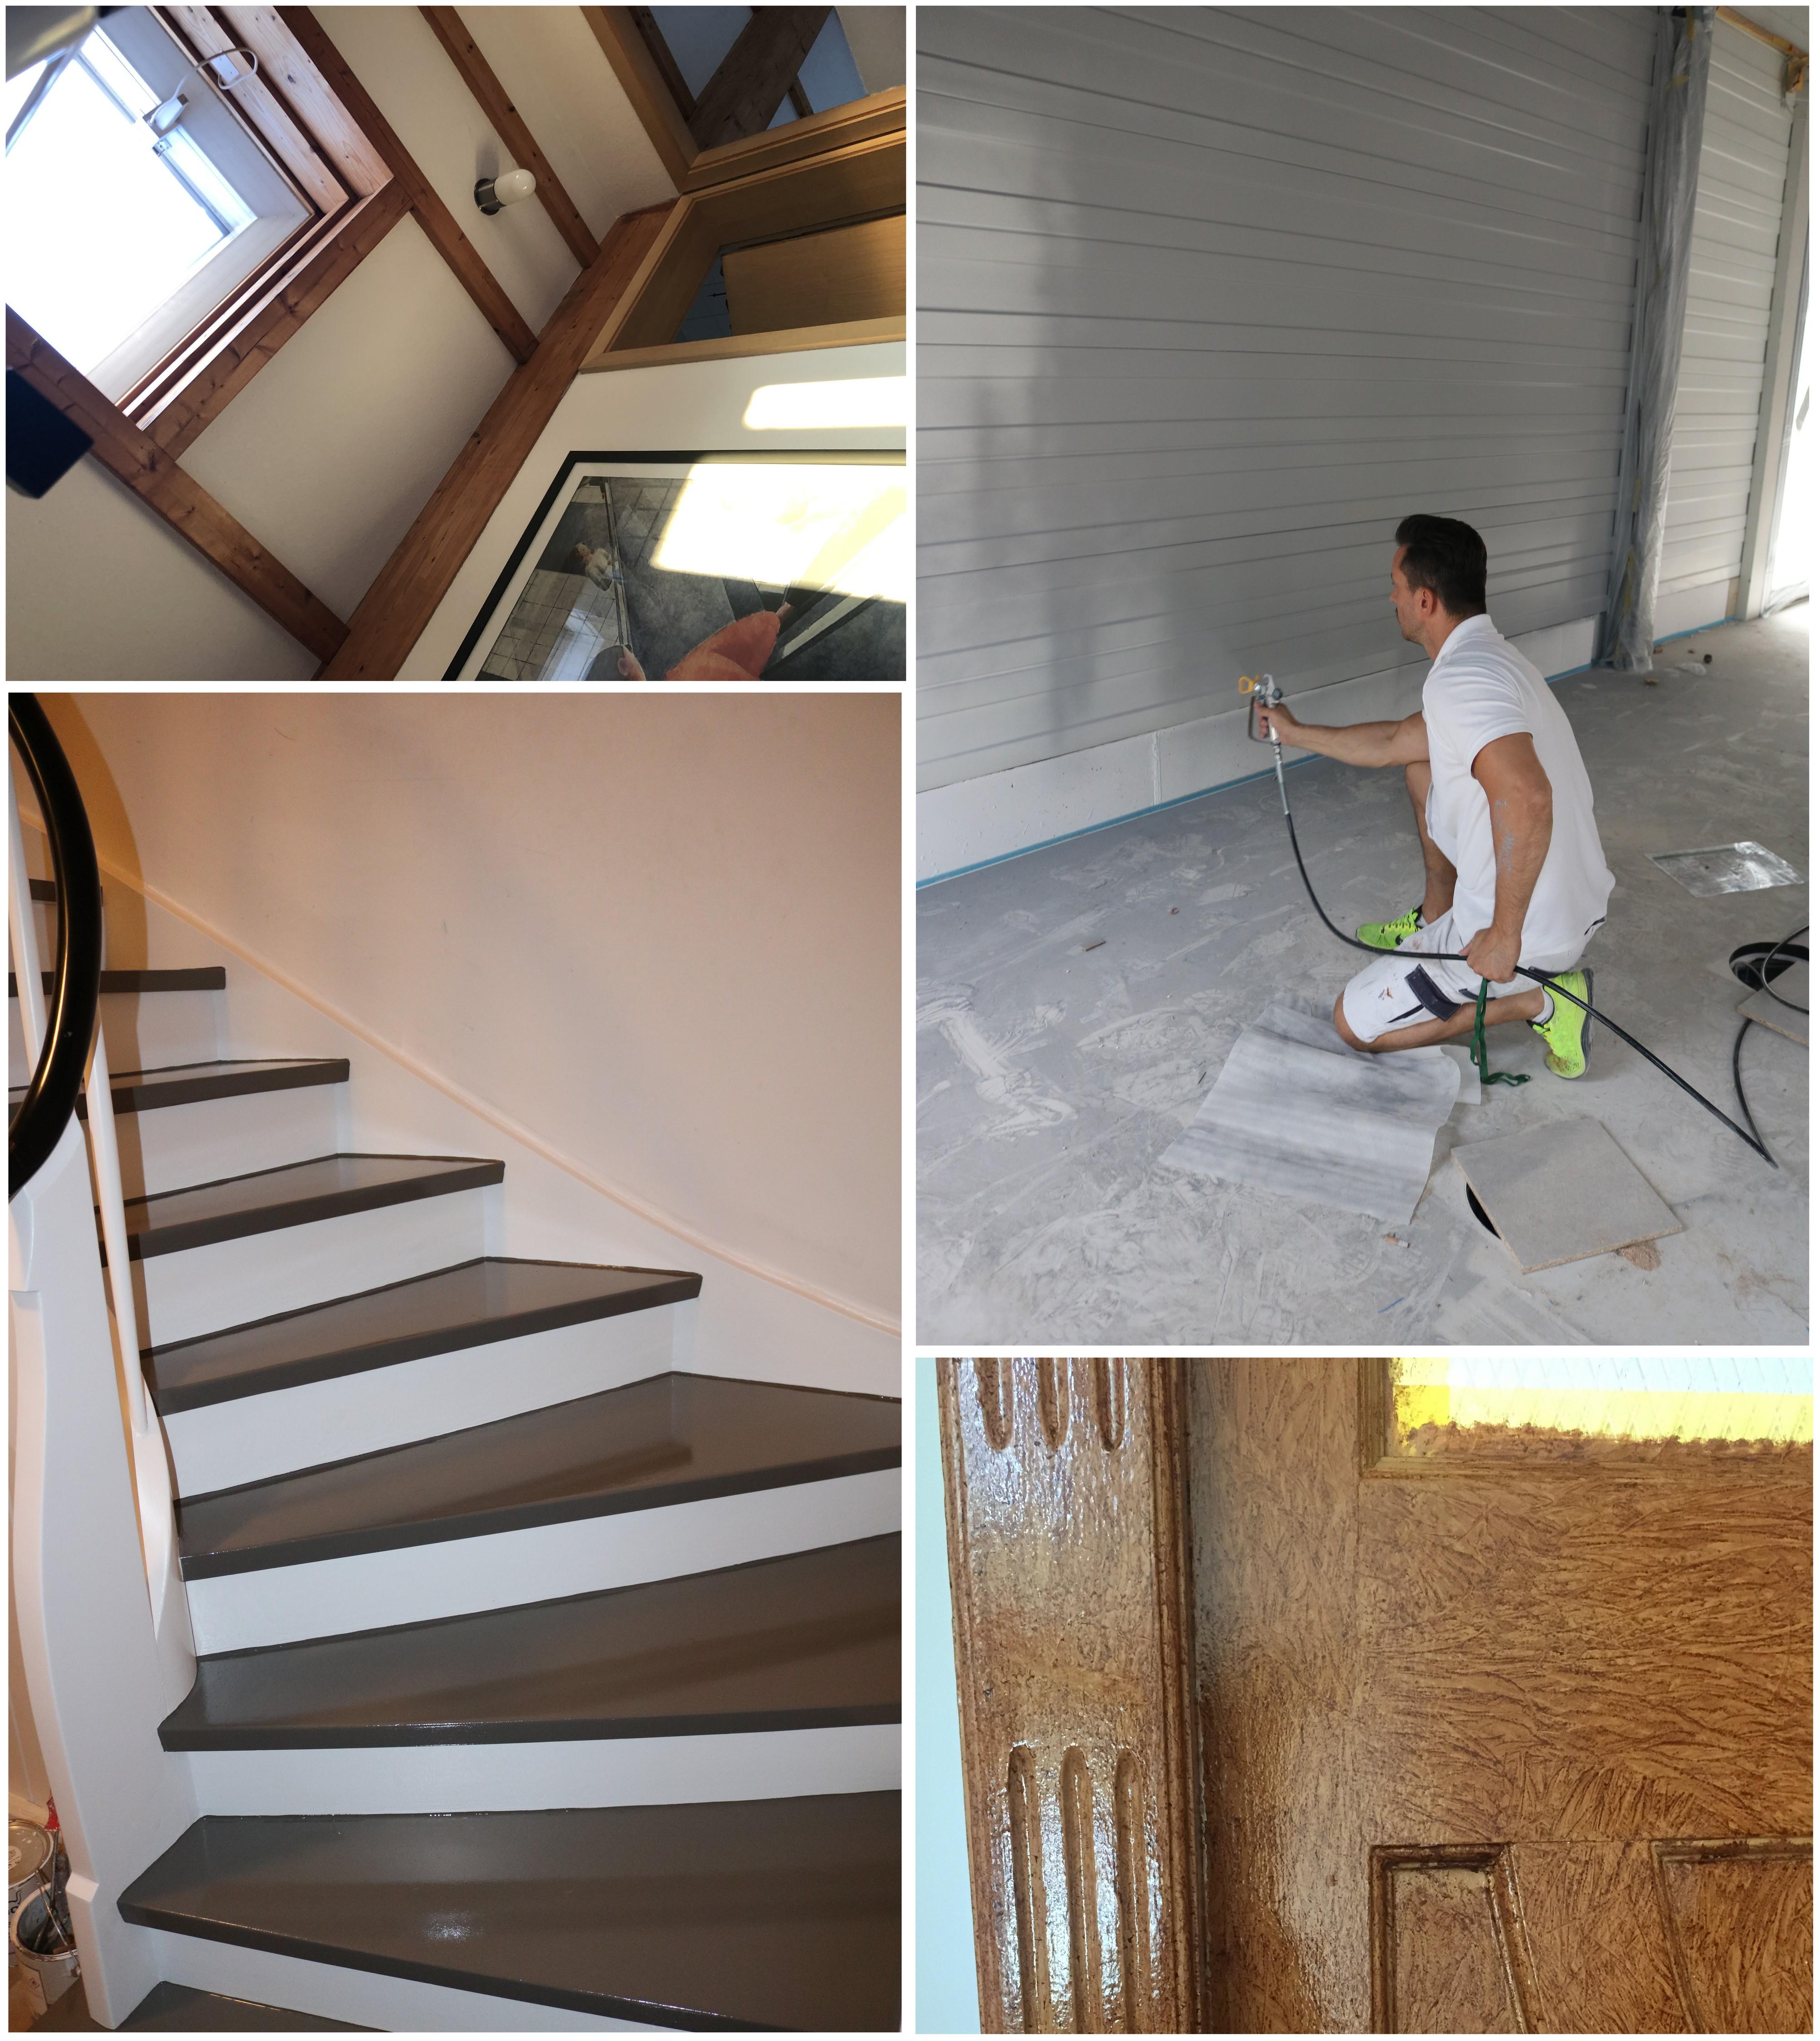 Malerfachbetrieb Ajvazi